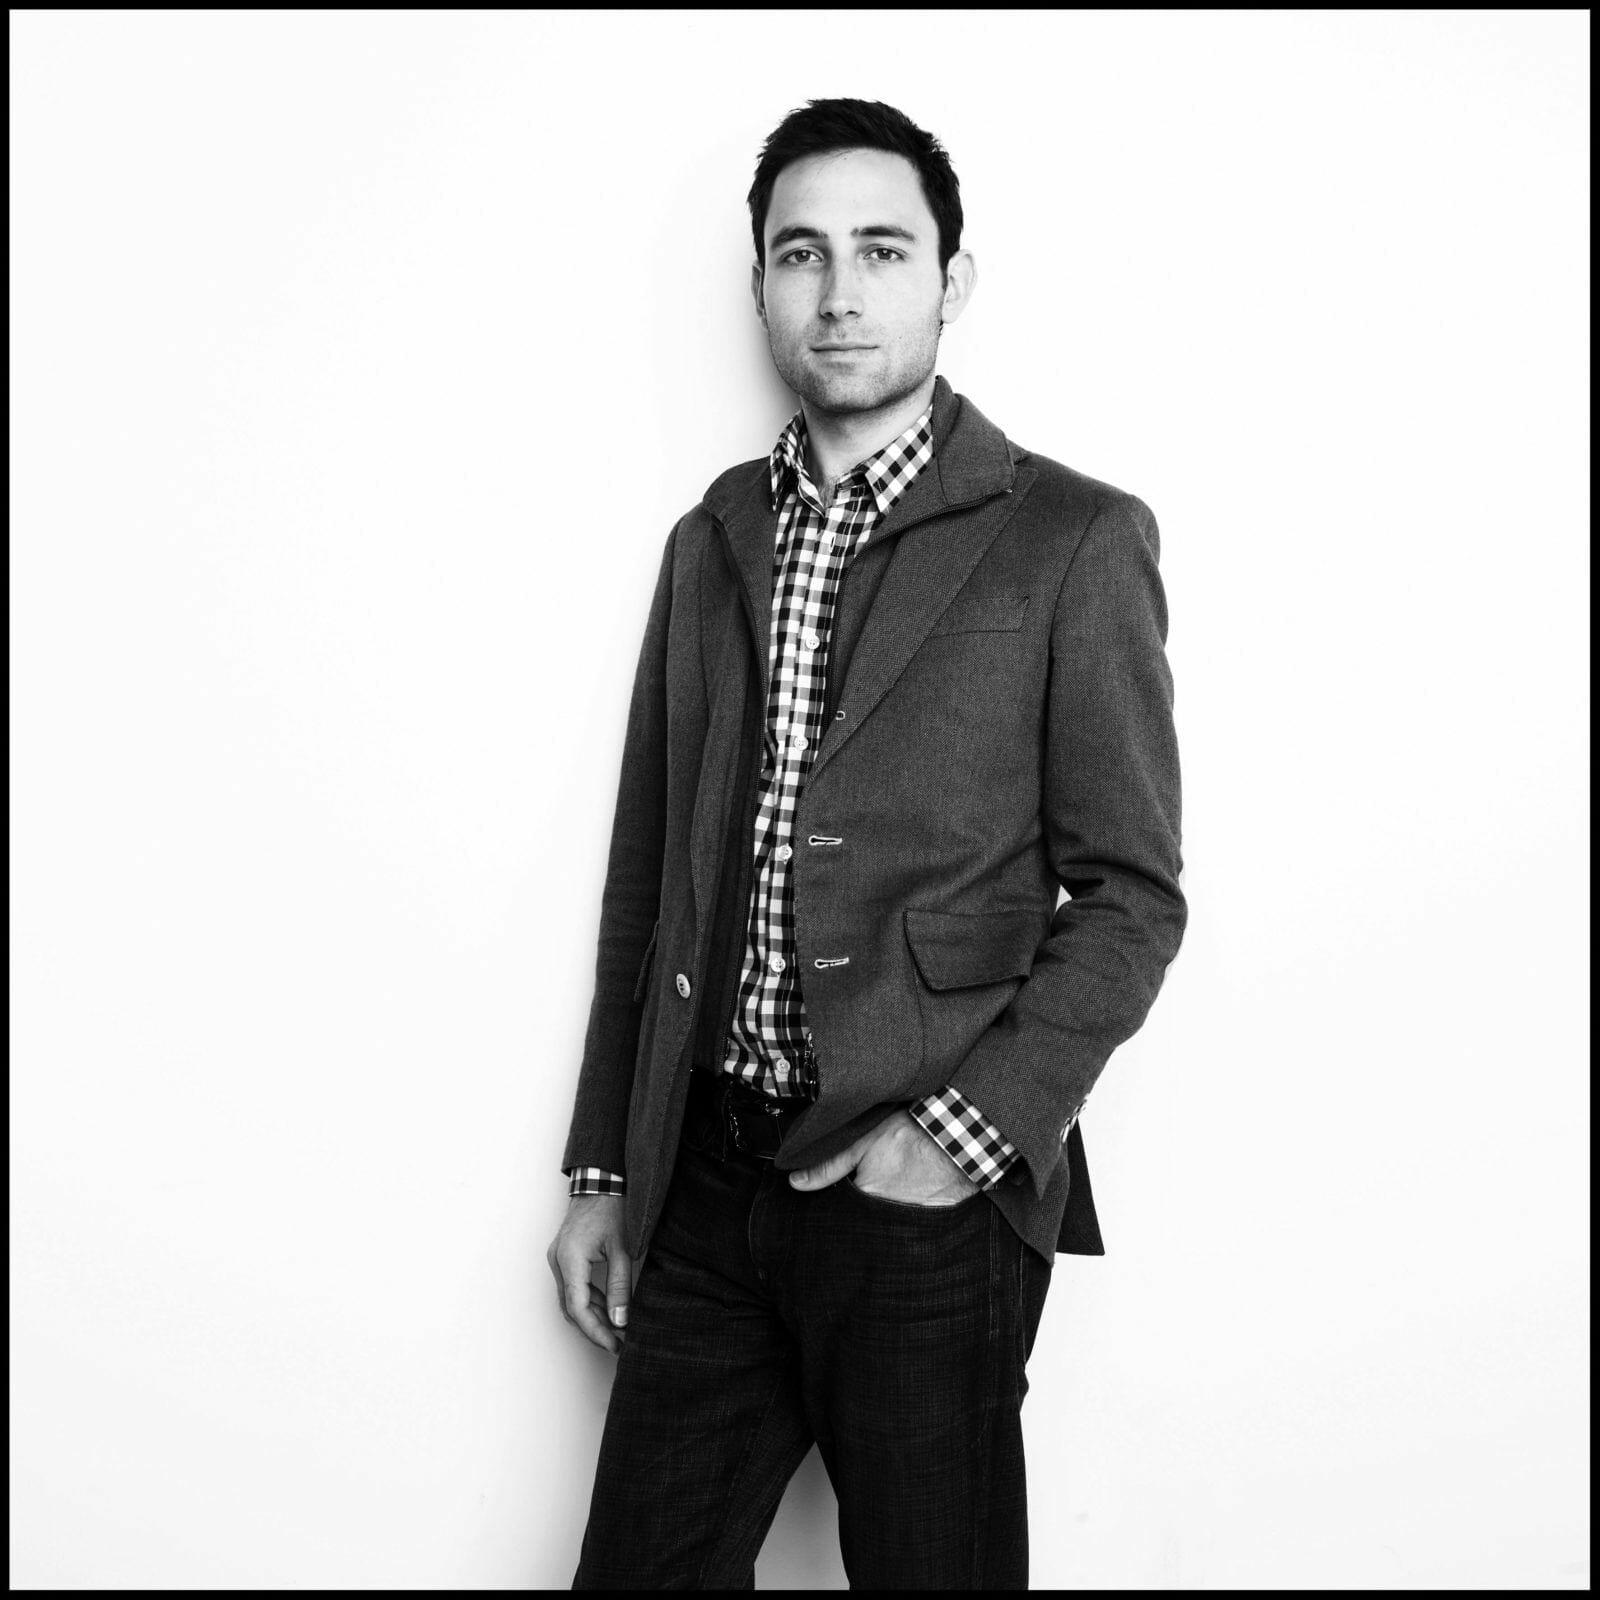 Scott Belsky - Founder of Behance